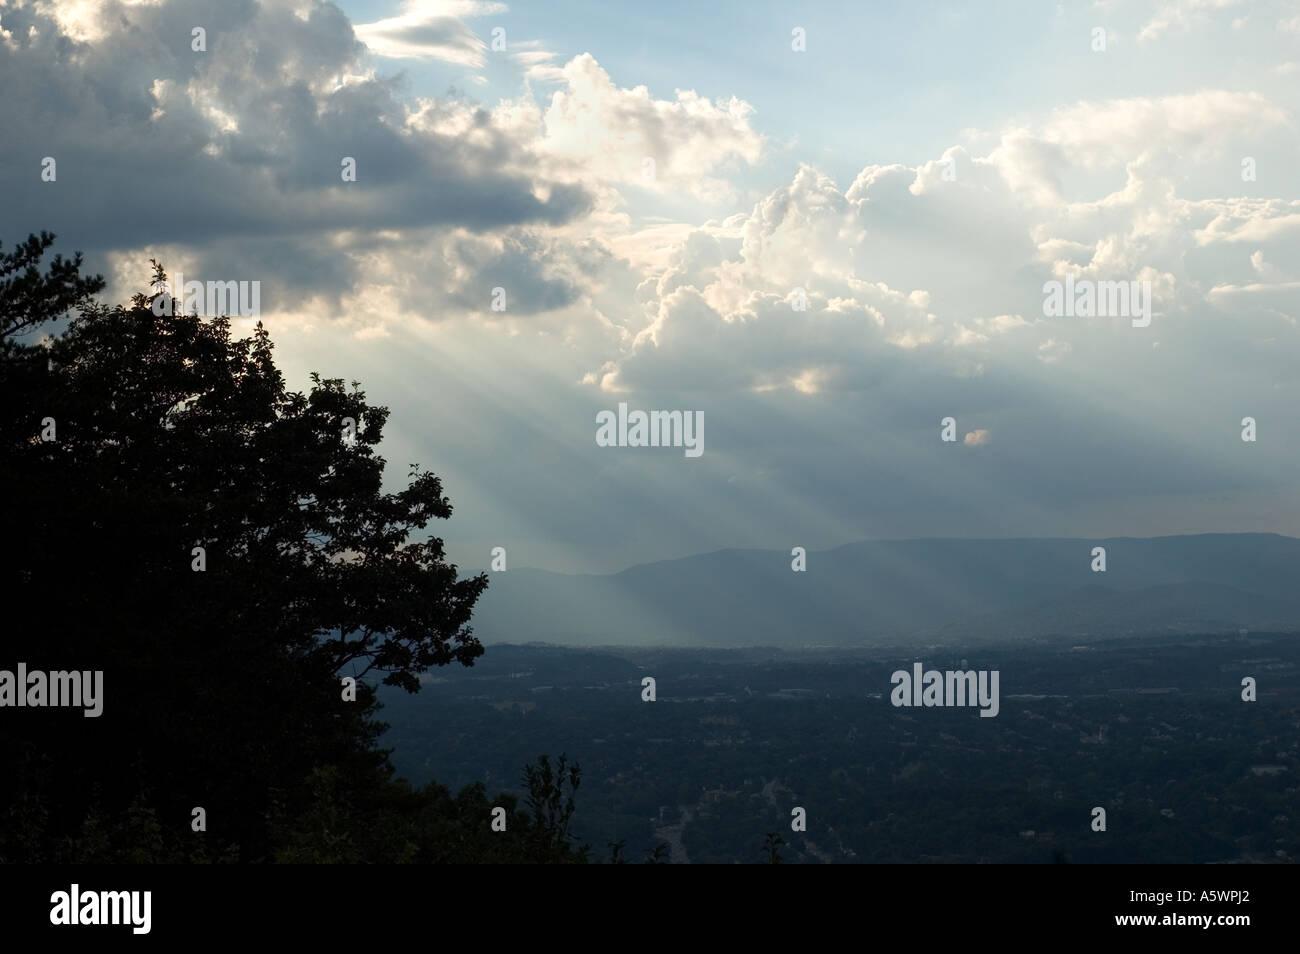 Landscape of Roanoke, Virginia Stock Photo